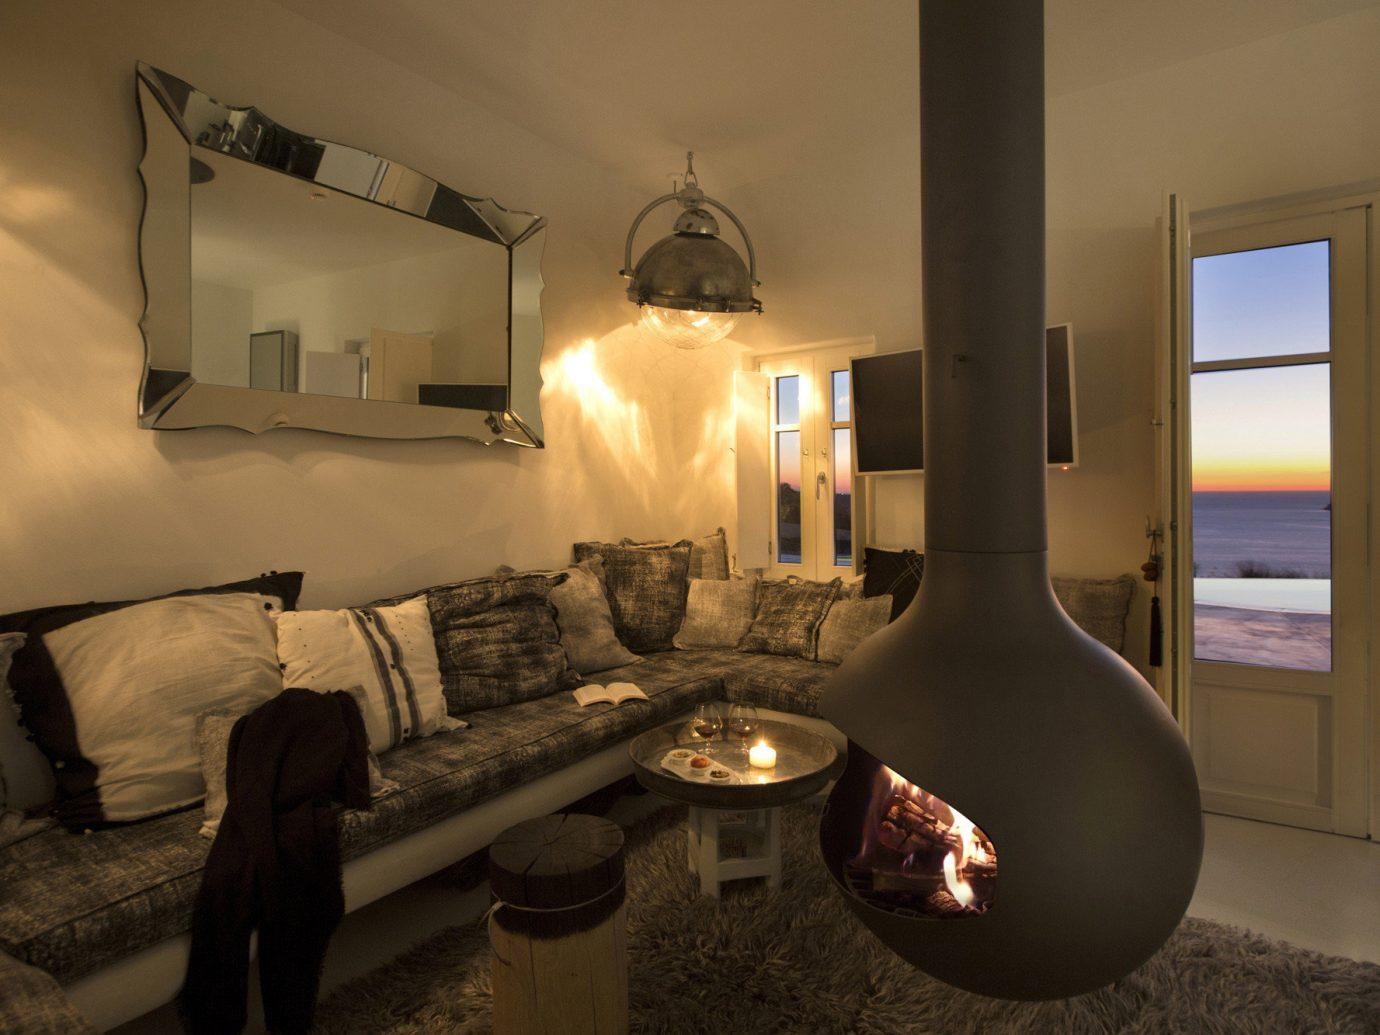 Greece Hotels Santorini wall indoor room interior design living room home lighting window house Suite ceiling furniture light fixture interior designer